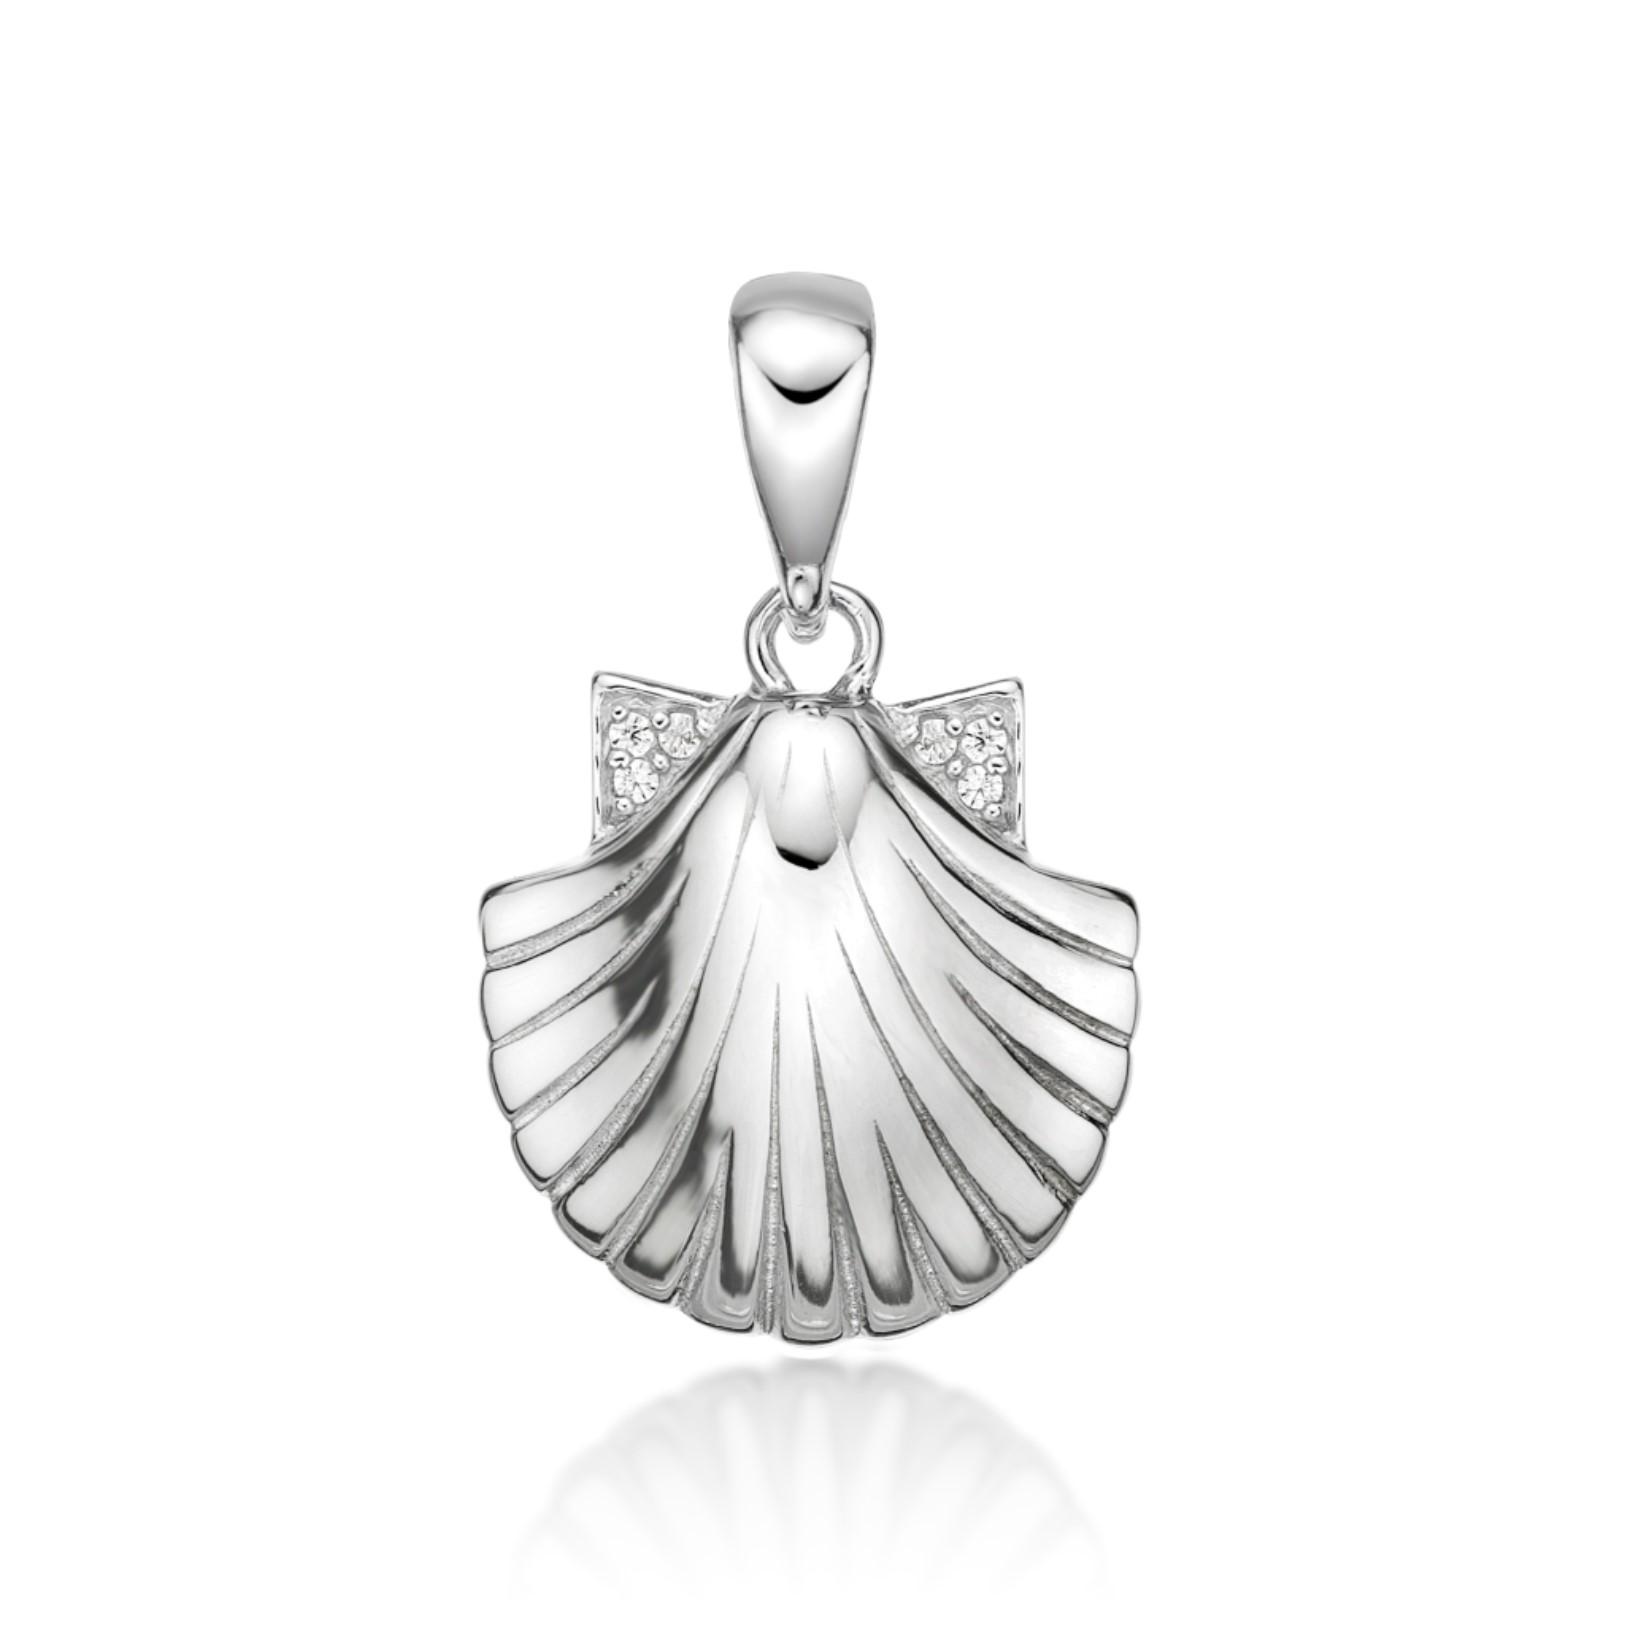 8x6mm NATURAL CITRINE Sterling Silver Post Ladies Earrings • SE002